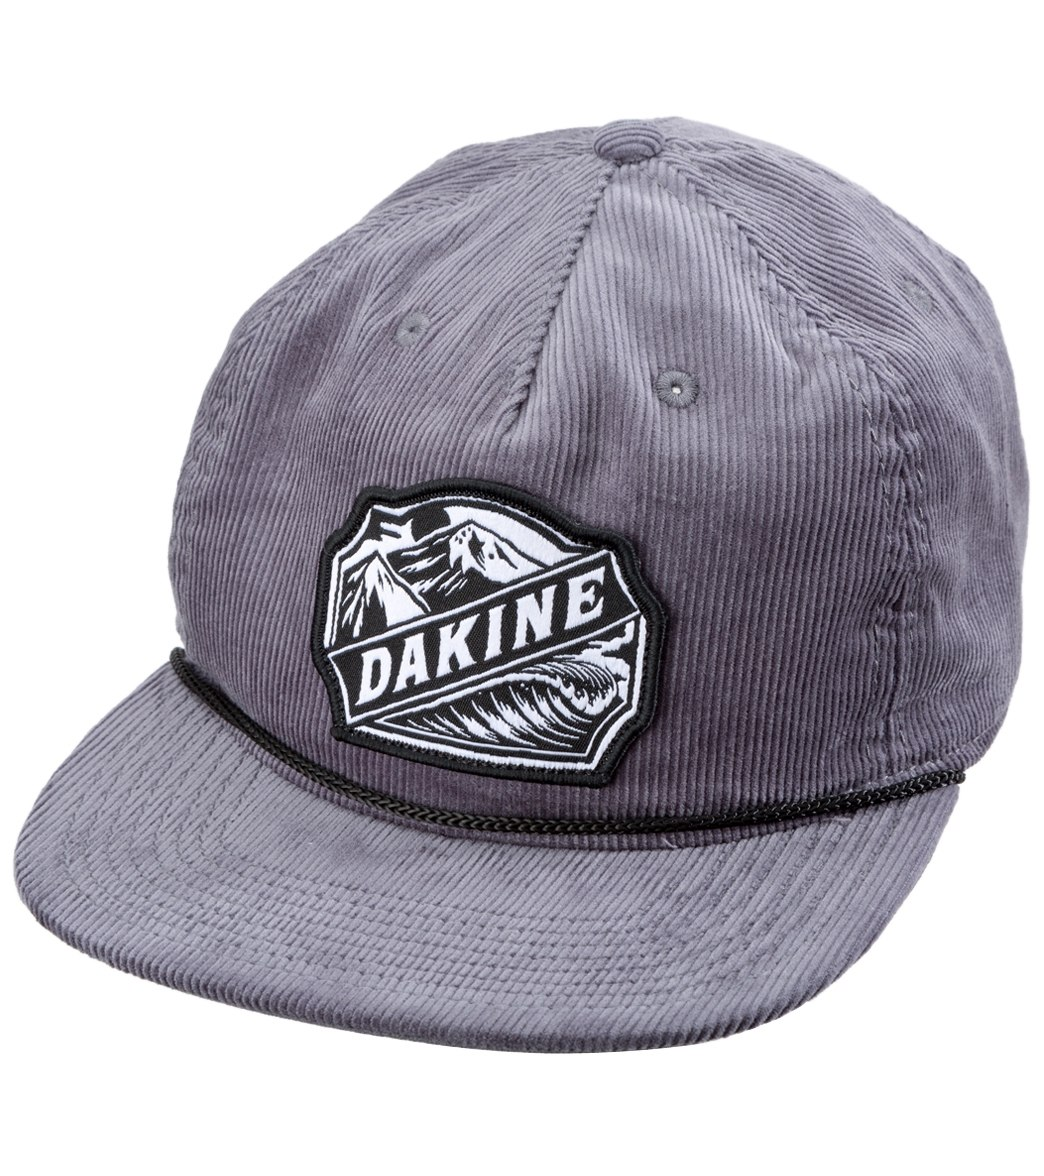 Dakine Men s Twin Peaks Hat at SwimOutlet.com b1e03fe5fcf